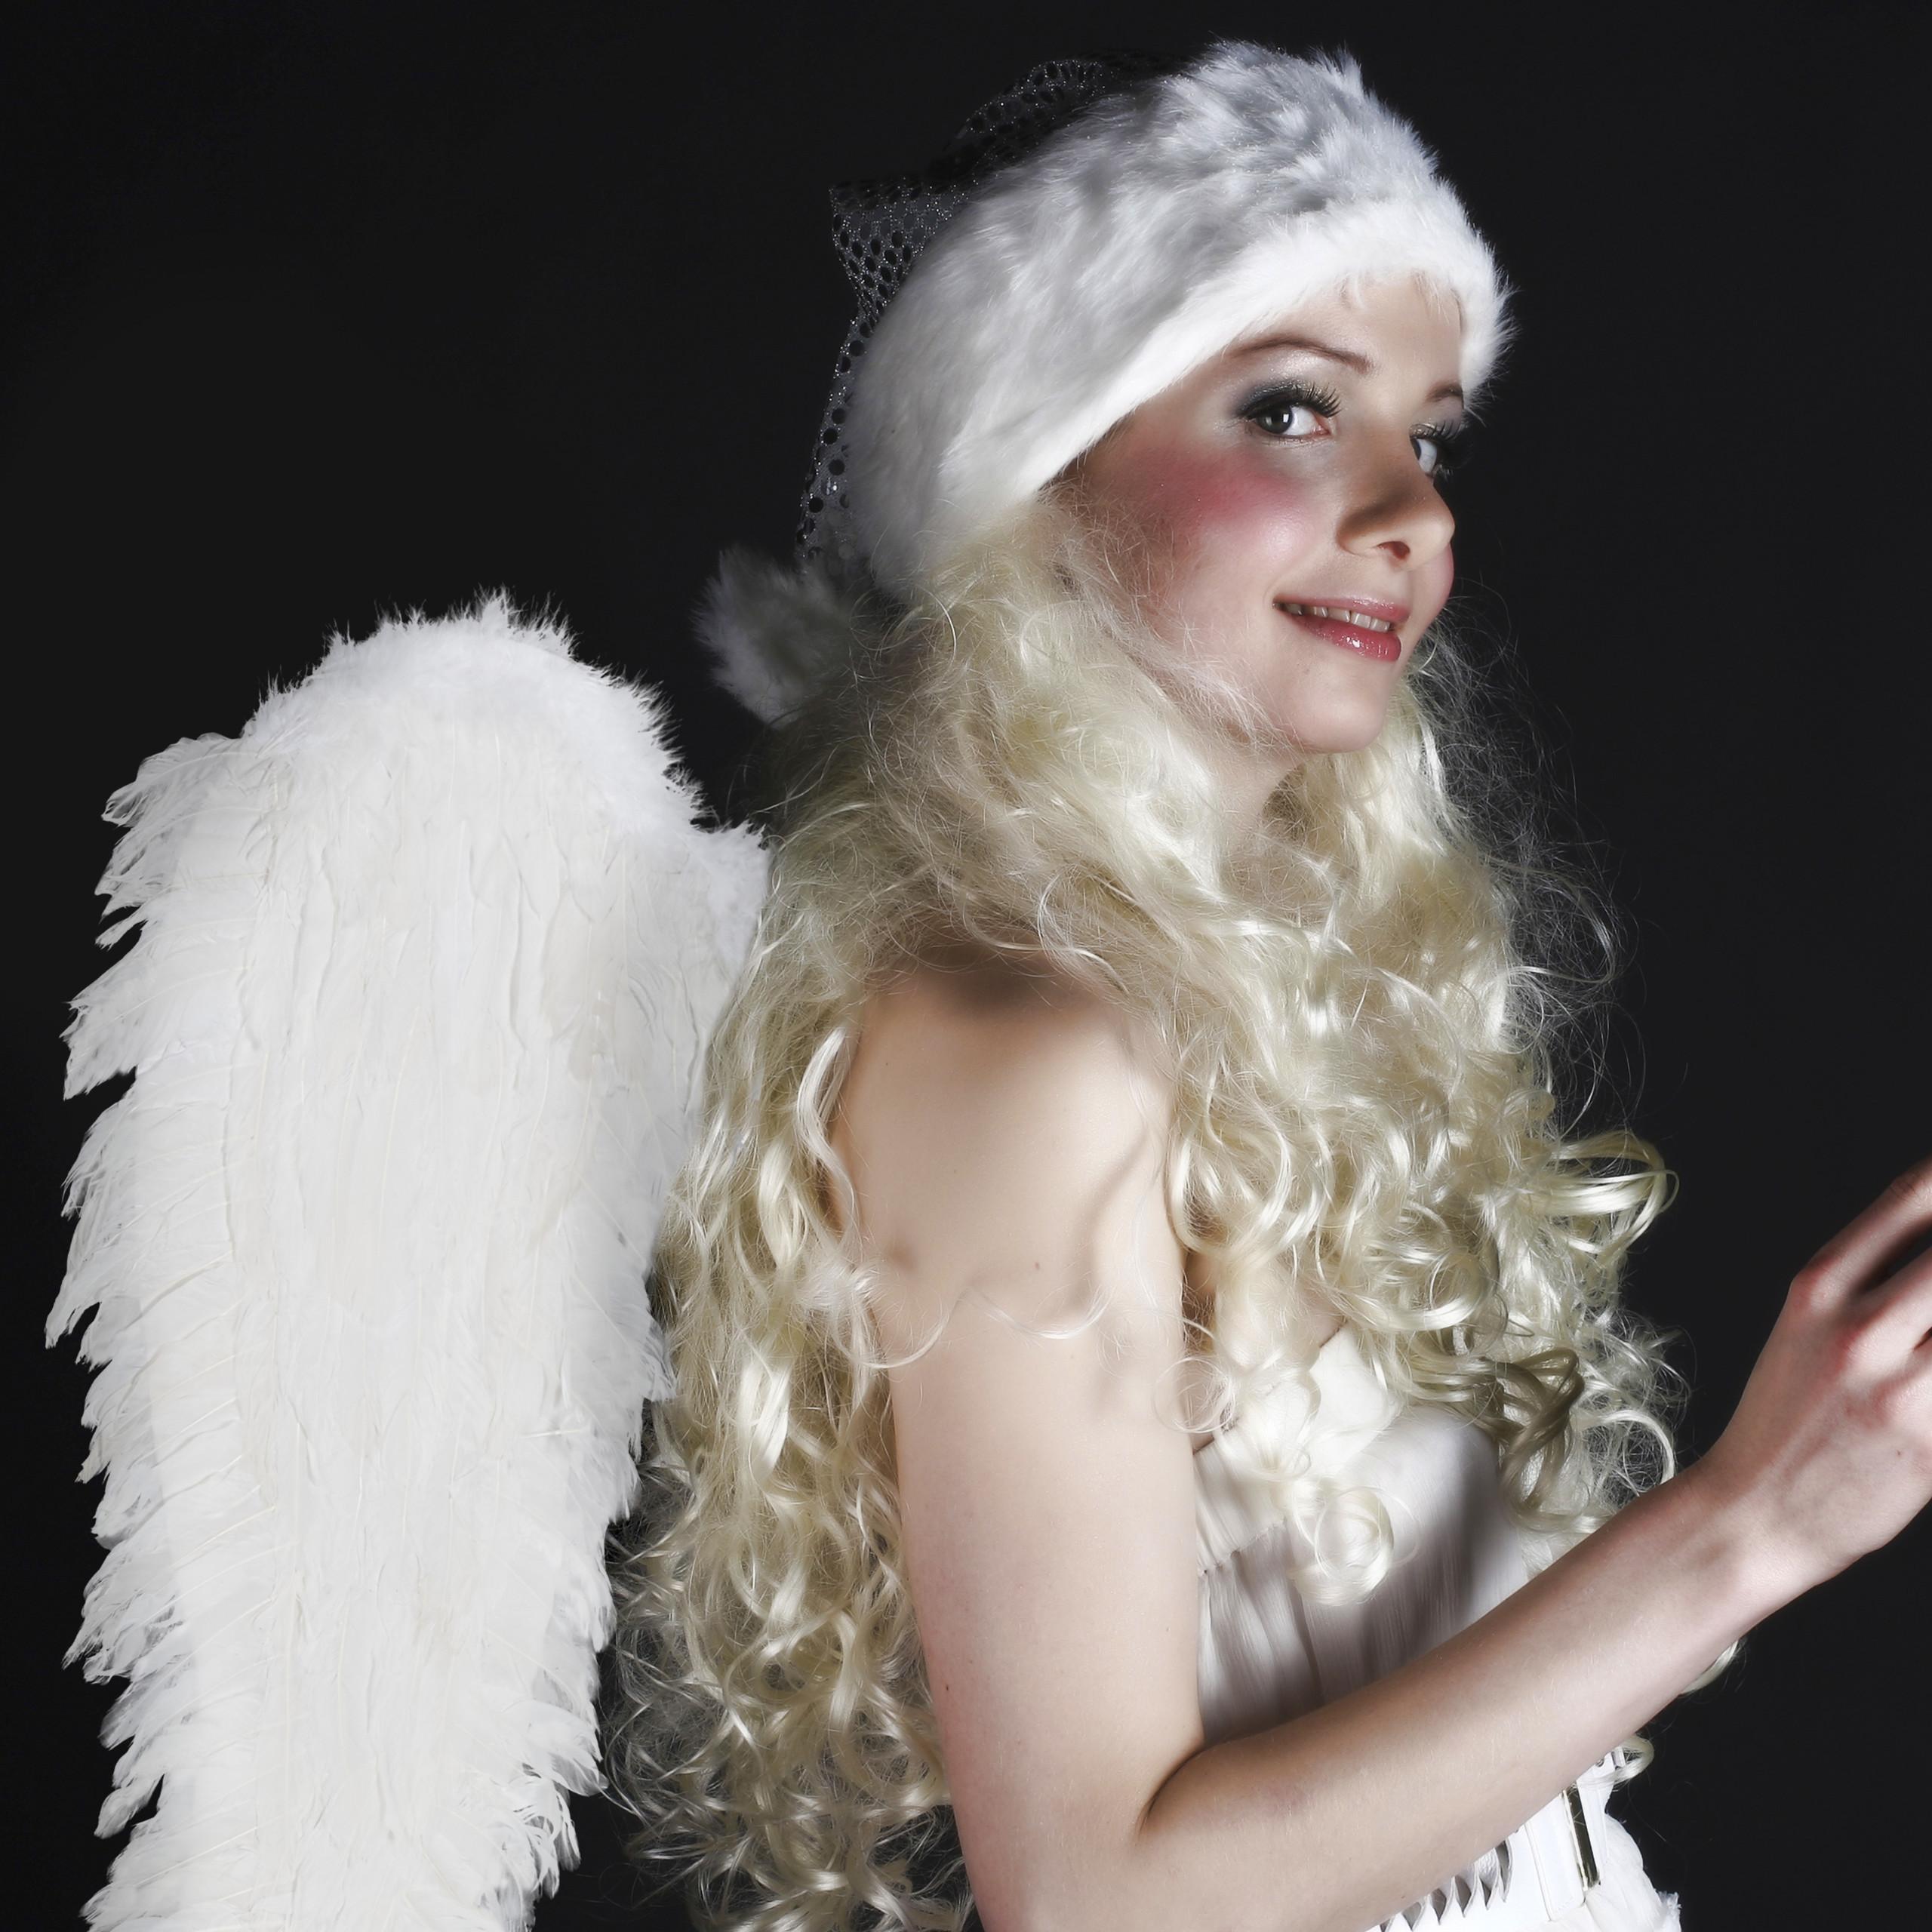 vleugels-verkleedkleding-XXL-engelenvleugels-engelkostuum-kunstveren miniatuur 6